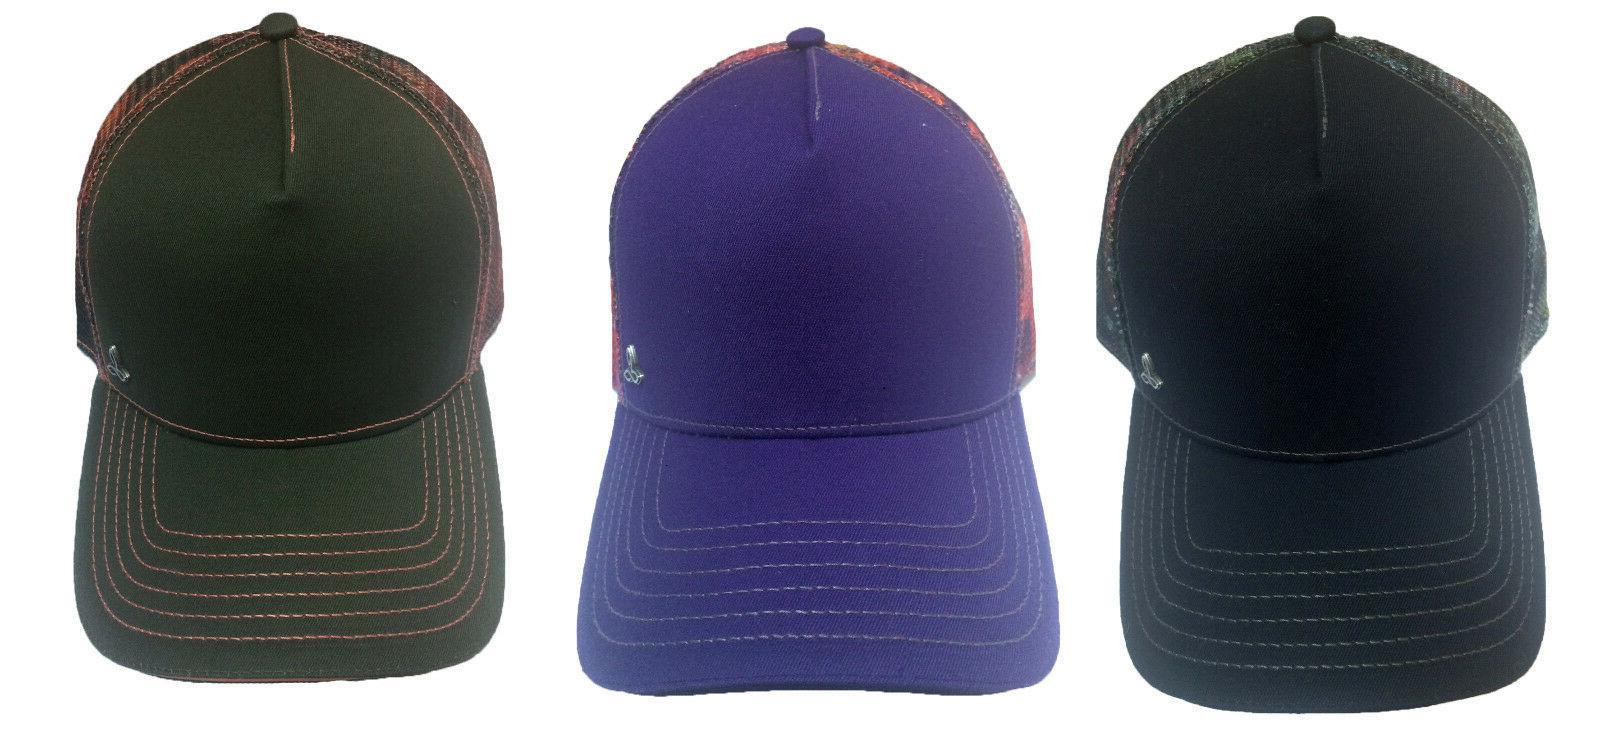 unisex idalis trucker mesh ball cap hat